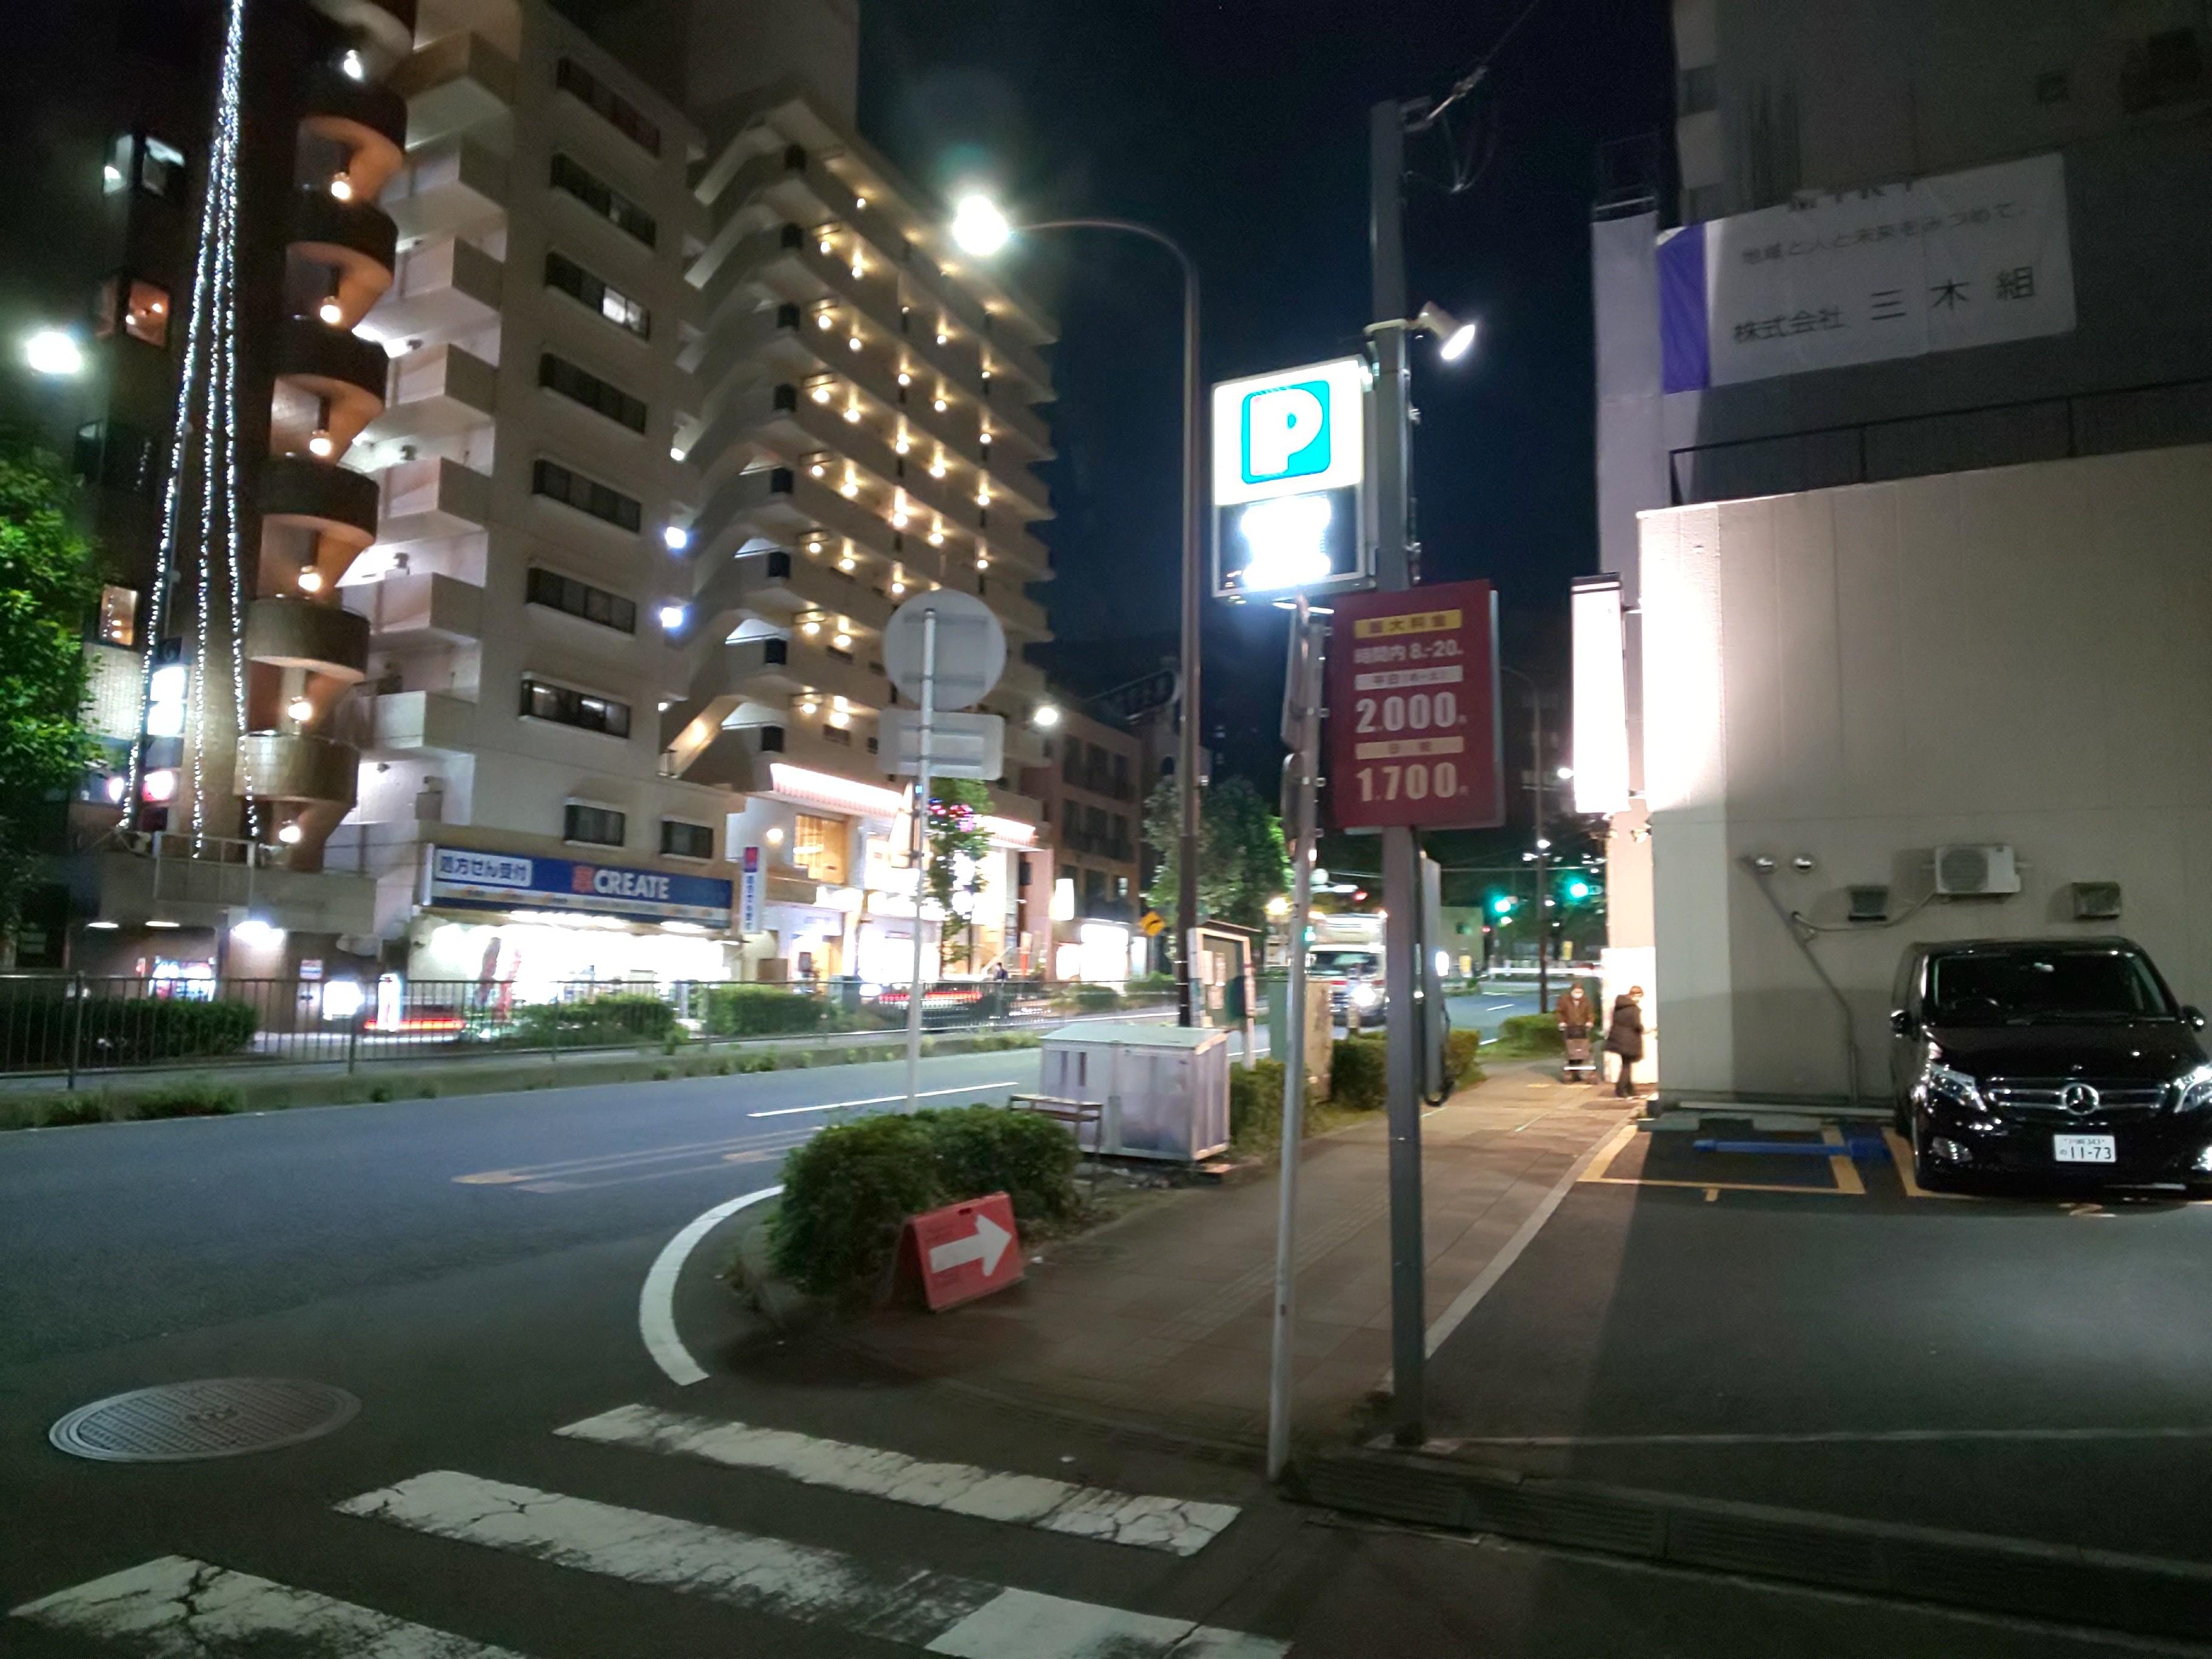 f:id:chiichii555:20201021203054j:image